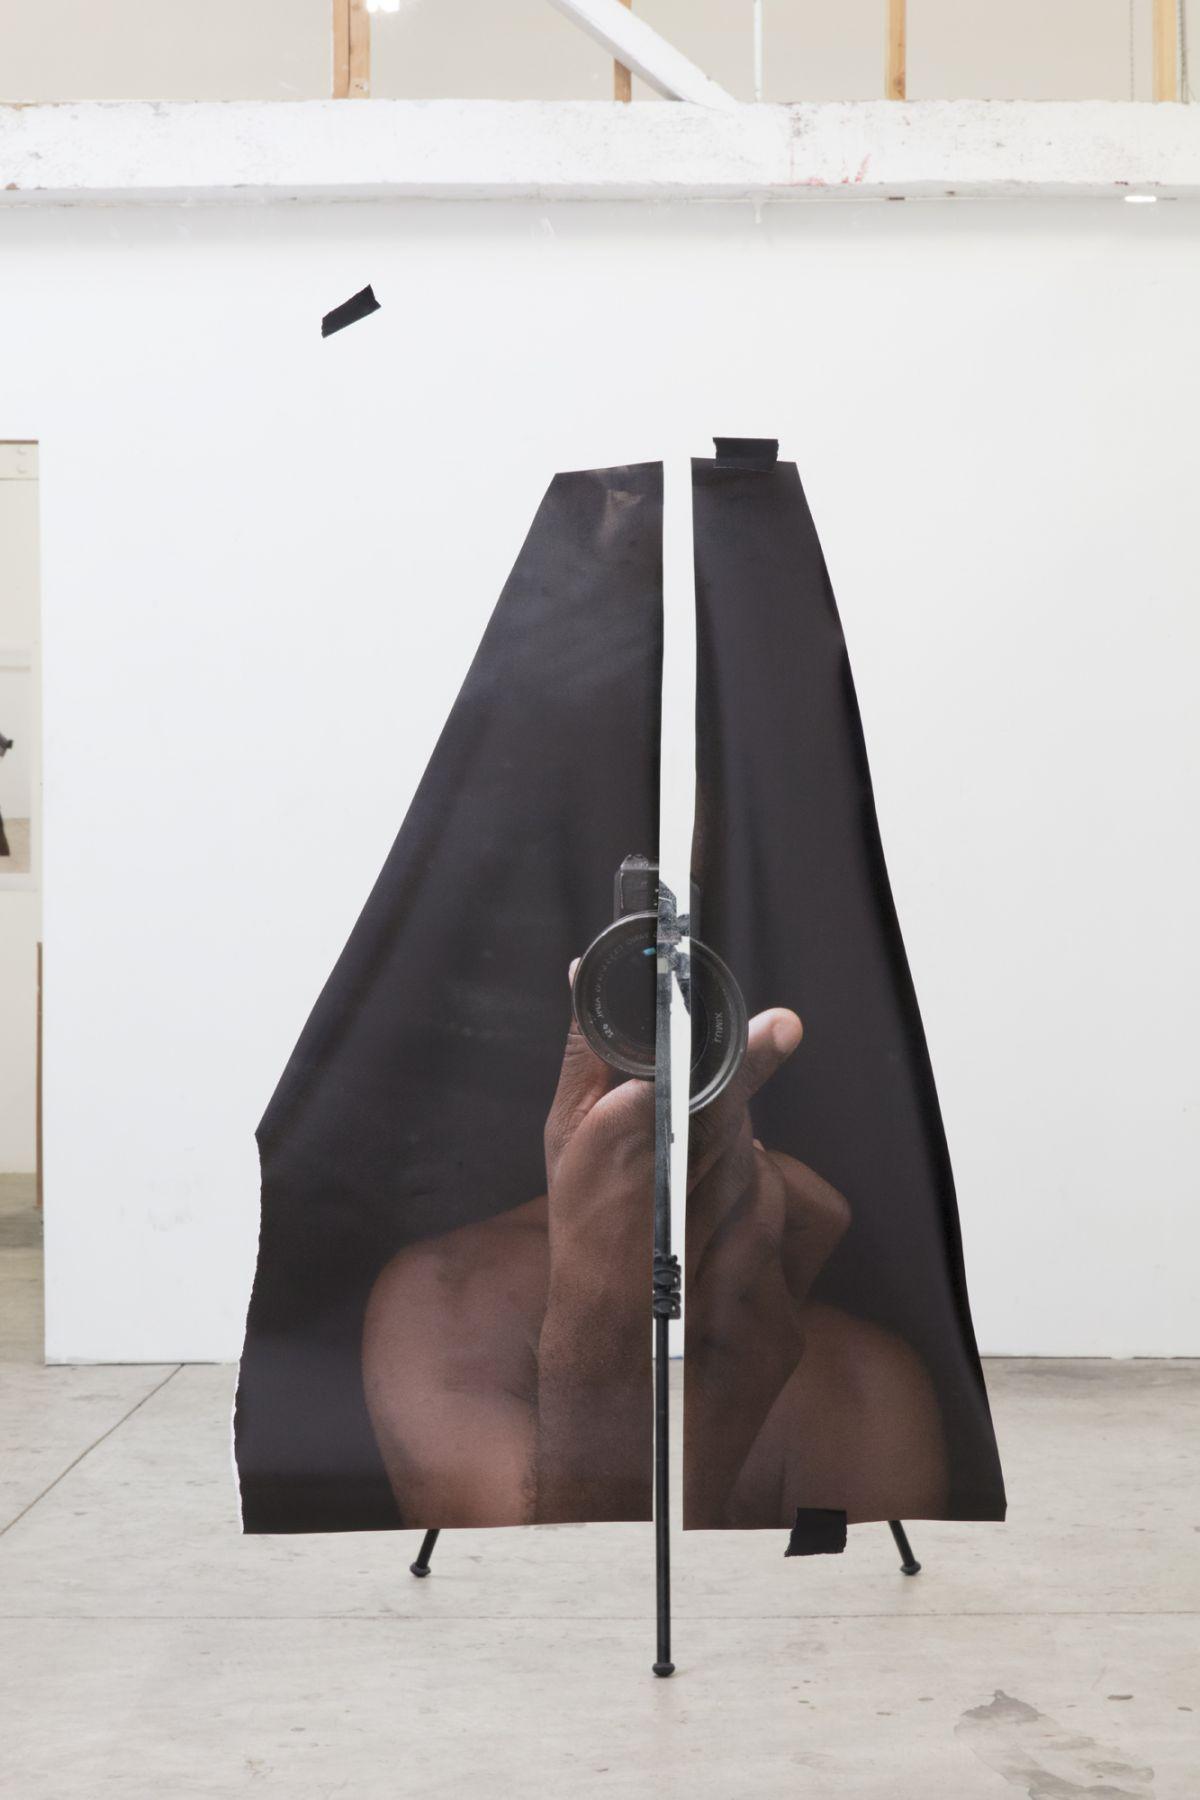 Paul Mpagi Sepuya,Mirror Study (0X5A7431),2018. Archival pigment print, 34 x 51 inches.